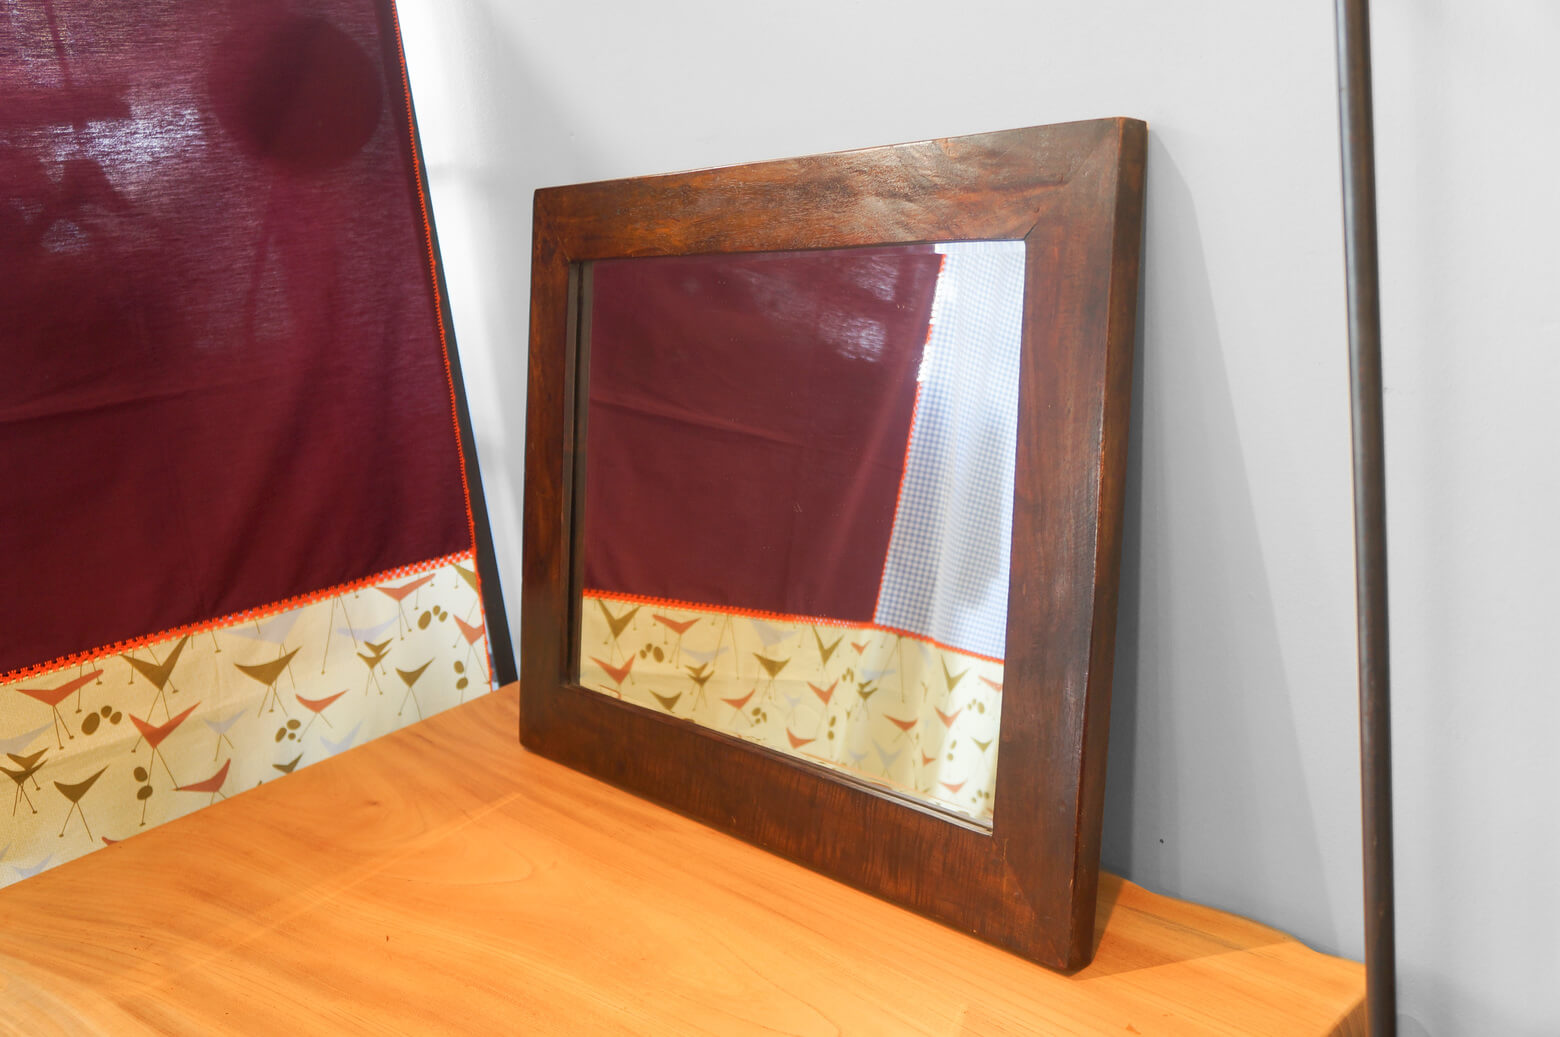 Antique Wood Flame Mirror/アンティーク ウッドフレーム ミラー